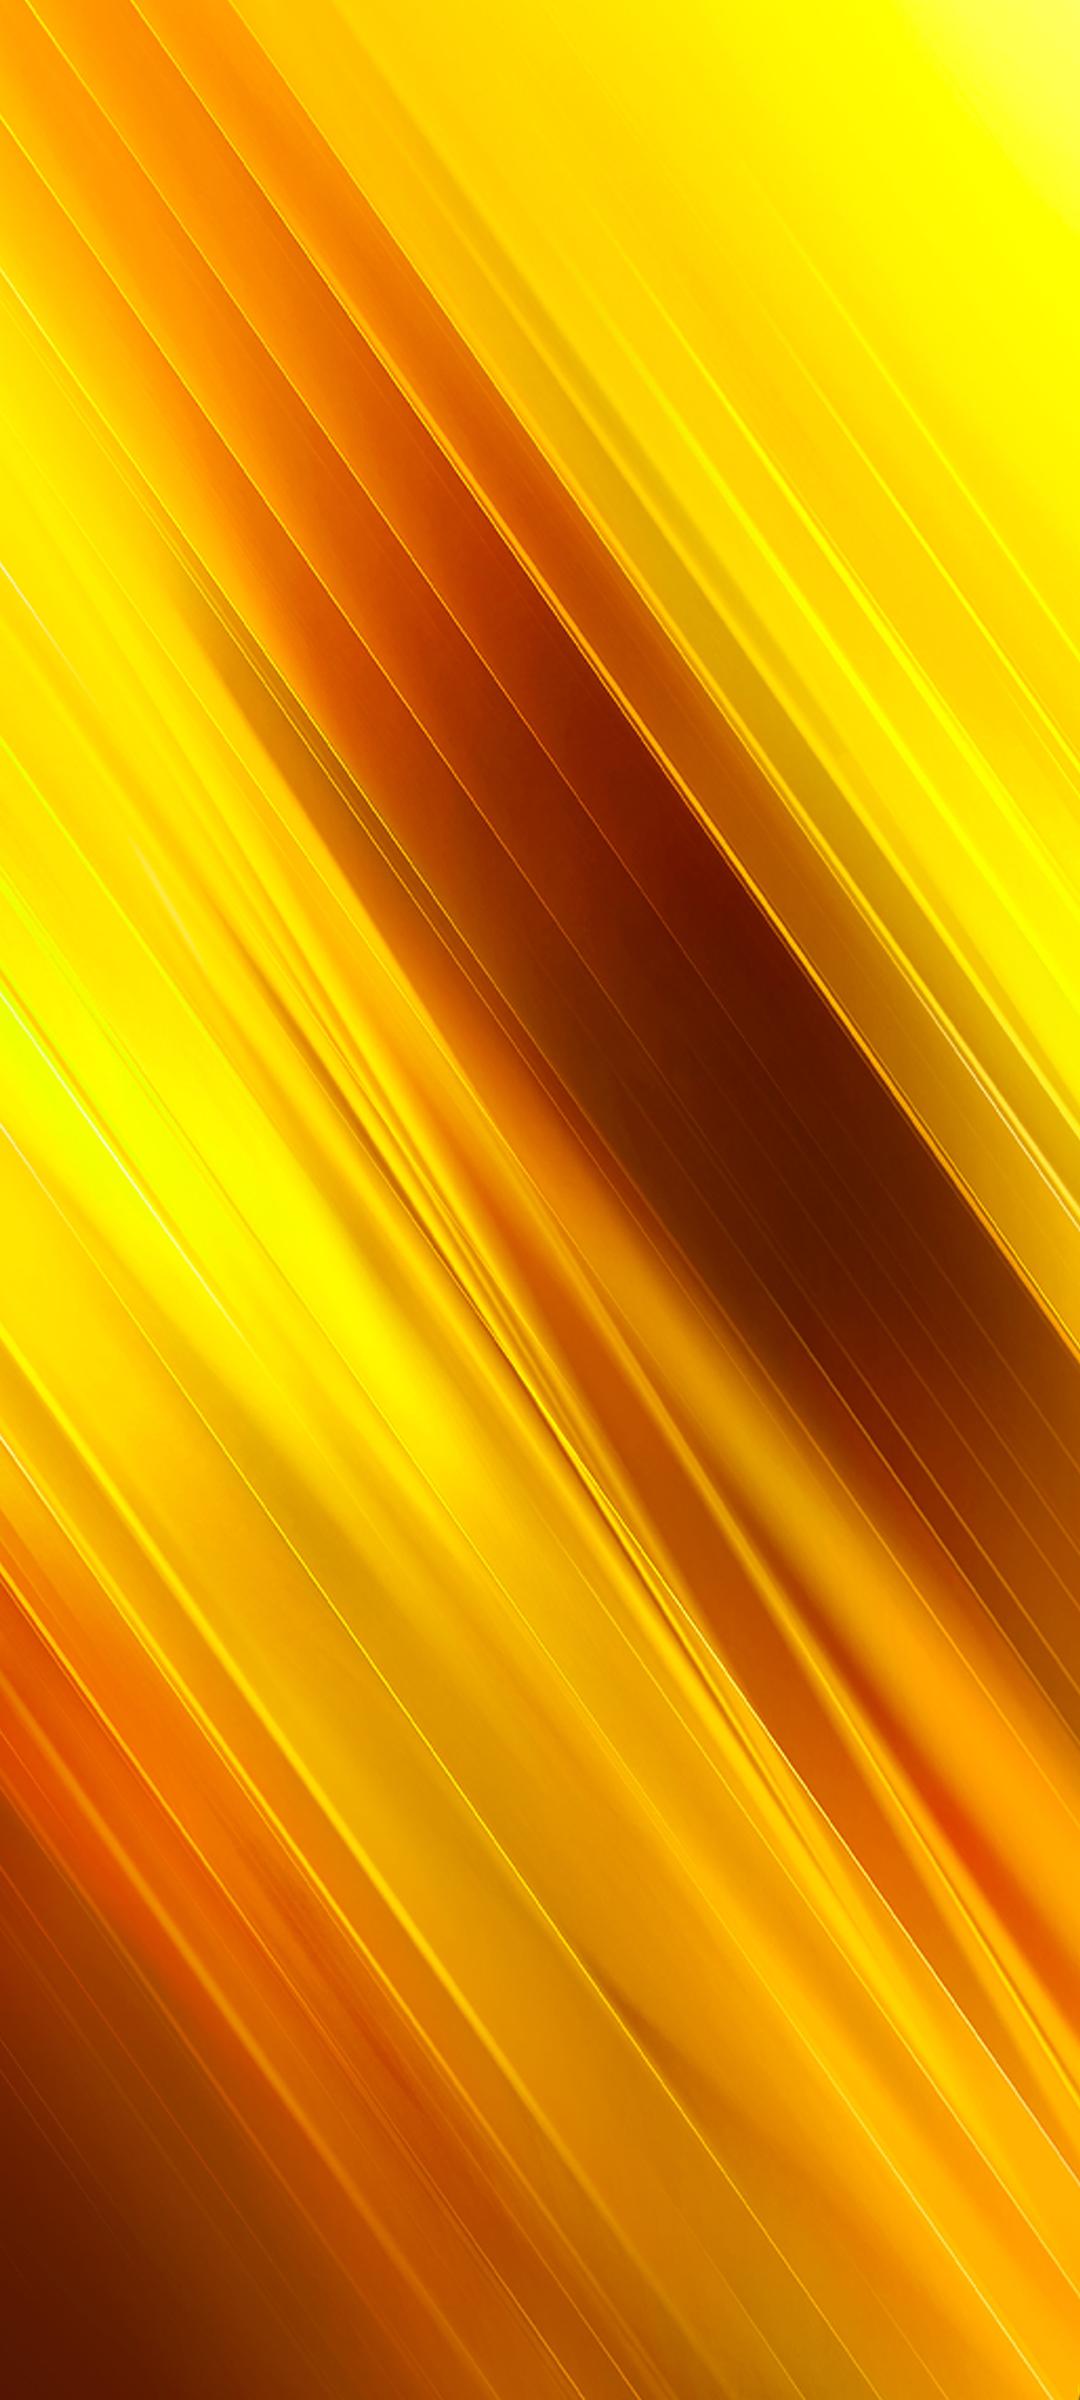 Background Orange Abstrak Hd : background, orange, abstrak, Wallpaper, (YTECHB, Exclusive), Xiaomi, Wallpapers,, Abstract, Iphone, Wallpaper,, Stock